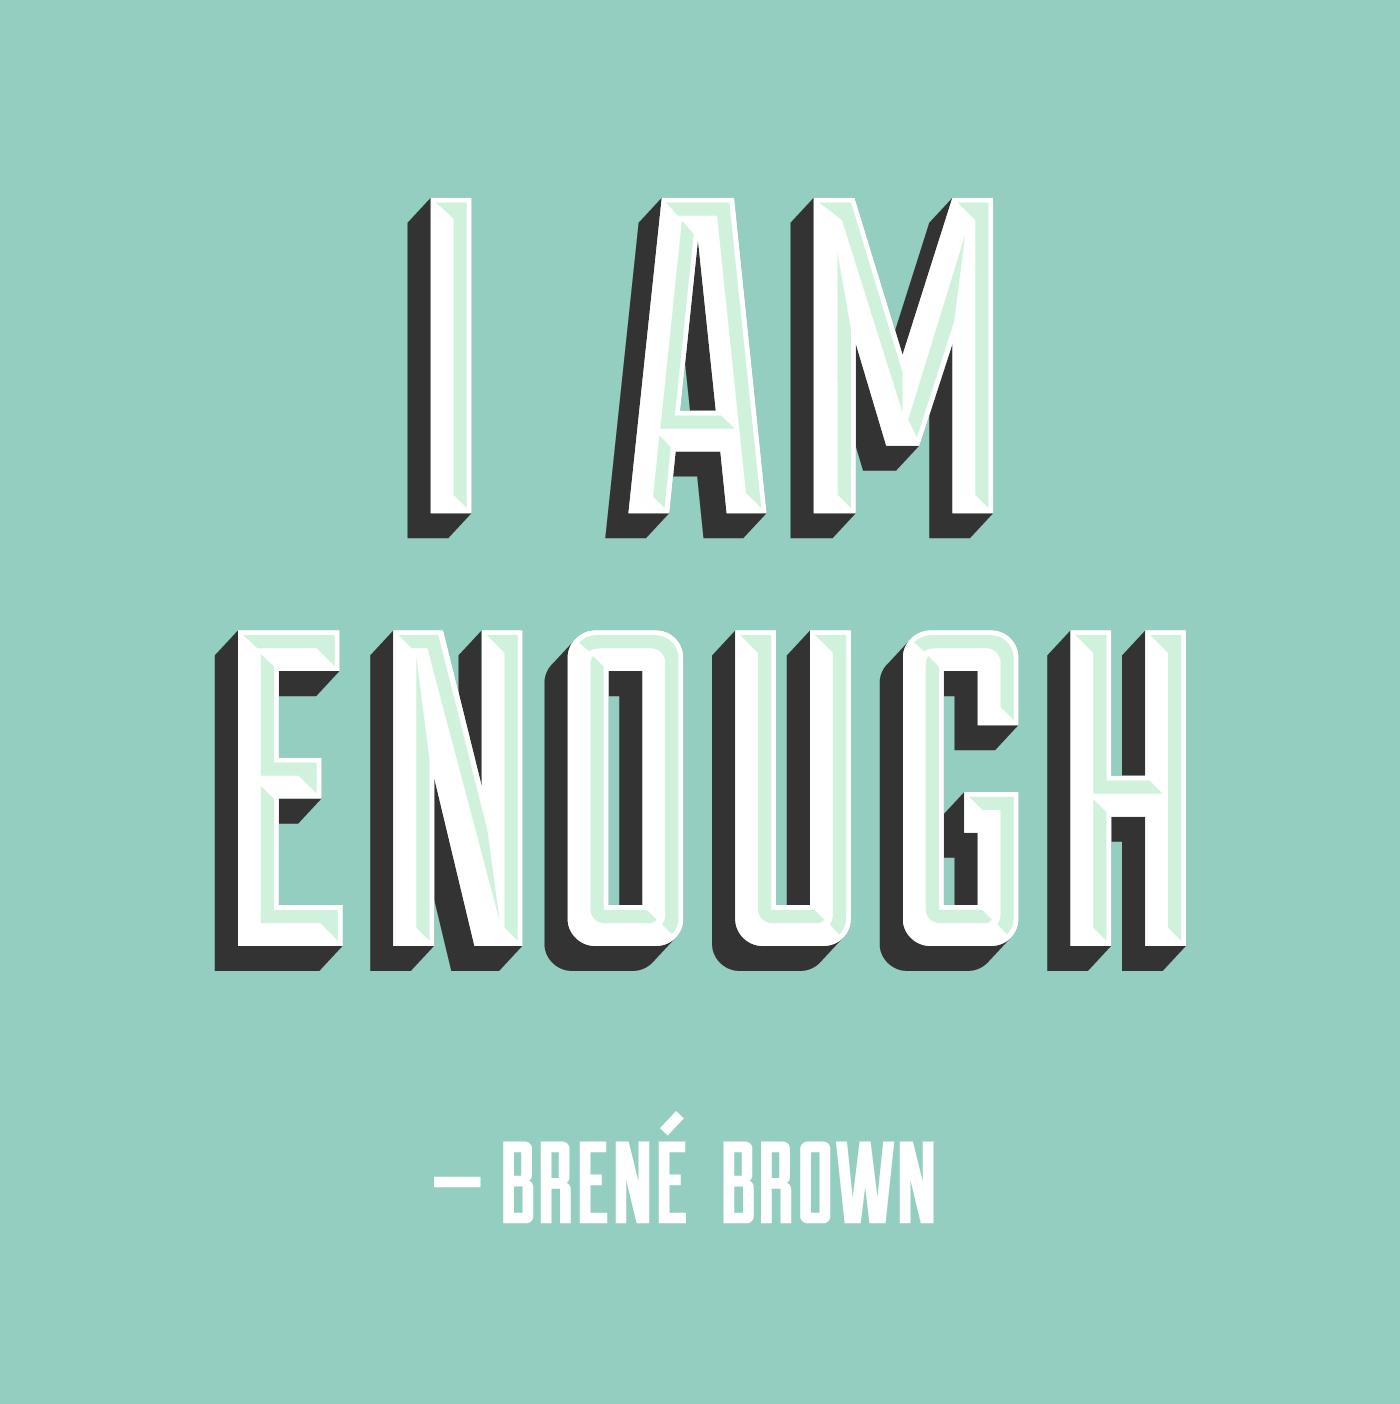 IAmEnough-Brené-Brown-Large - http-_liveandlearn.it_uploads_main_IAmEnough-Bren-Brown-Large